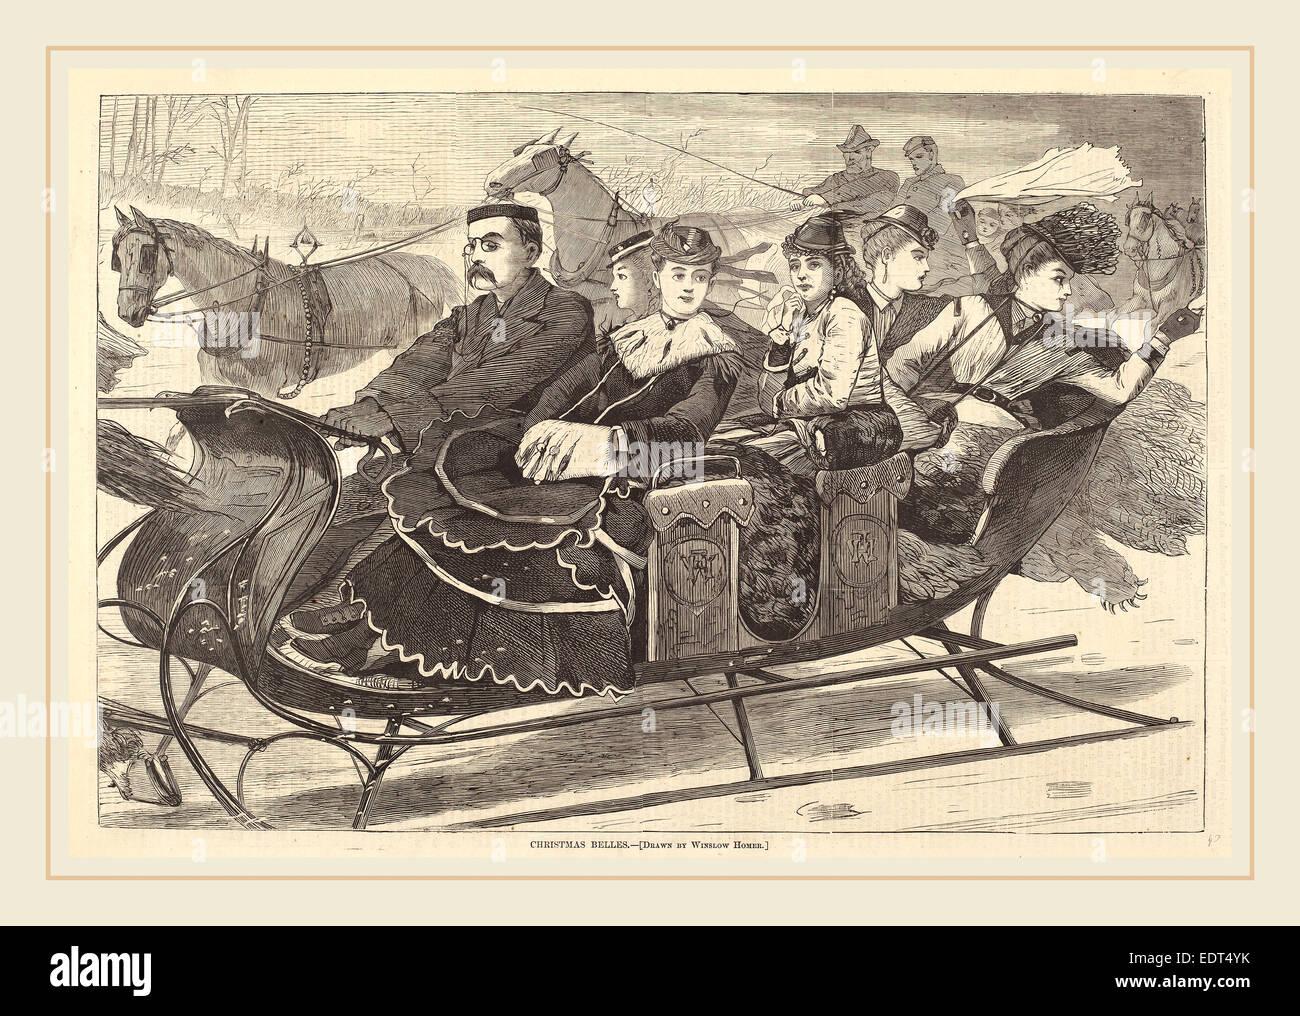 after Winslow Homer, Christmas Belles, published 1869, wood engraving - Stock Image